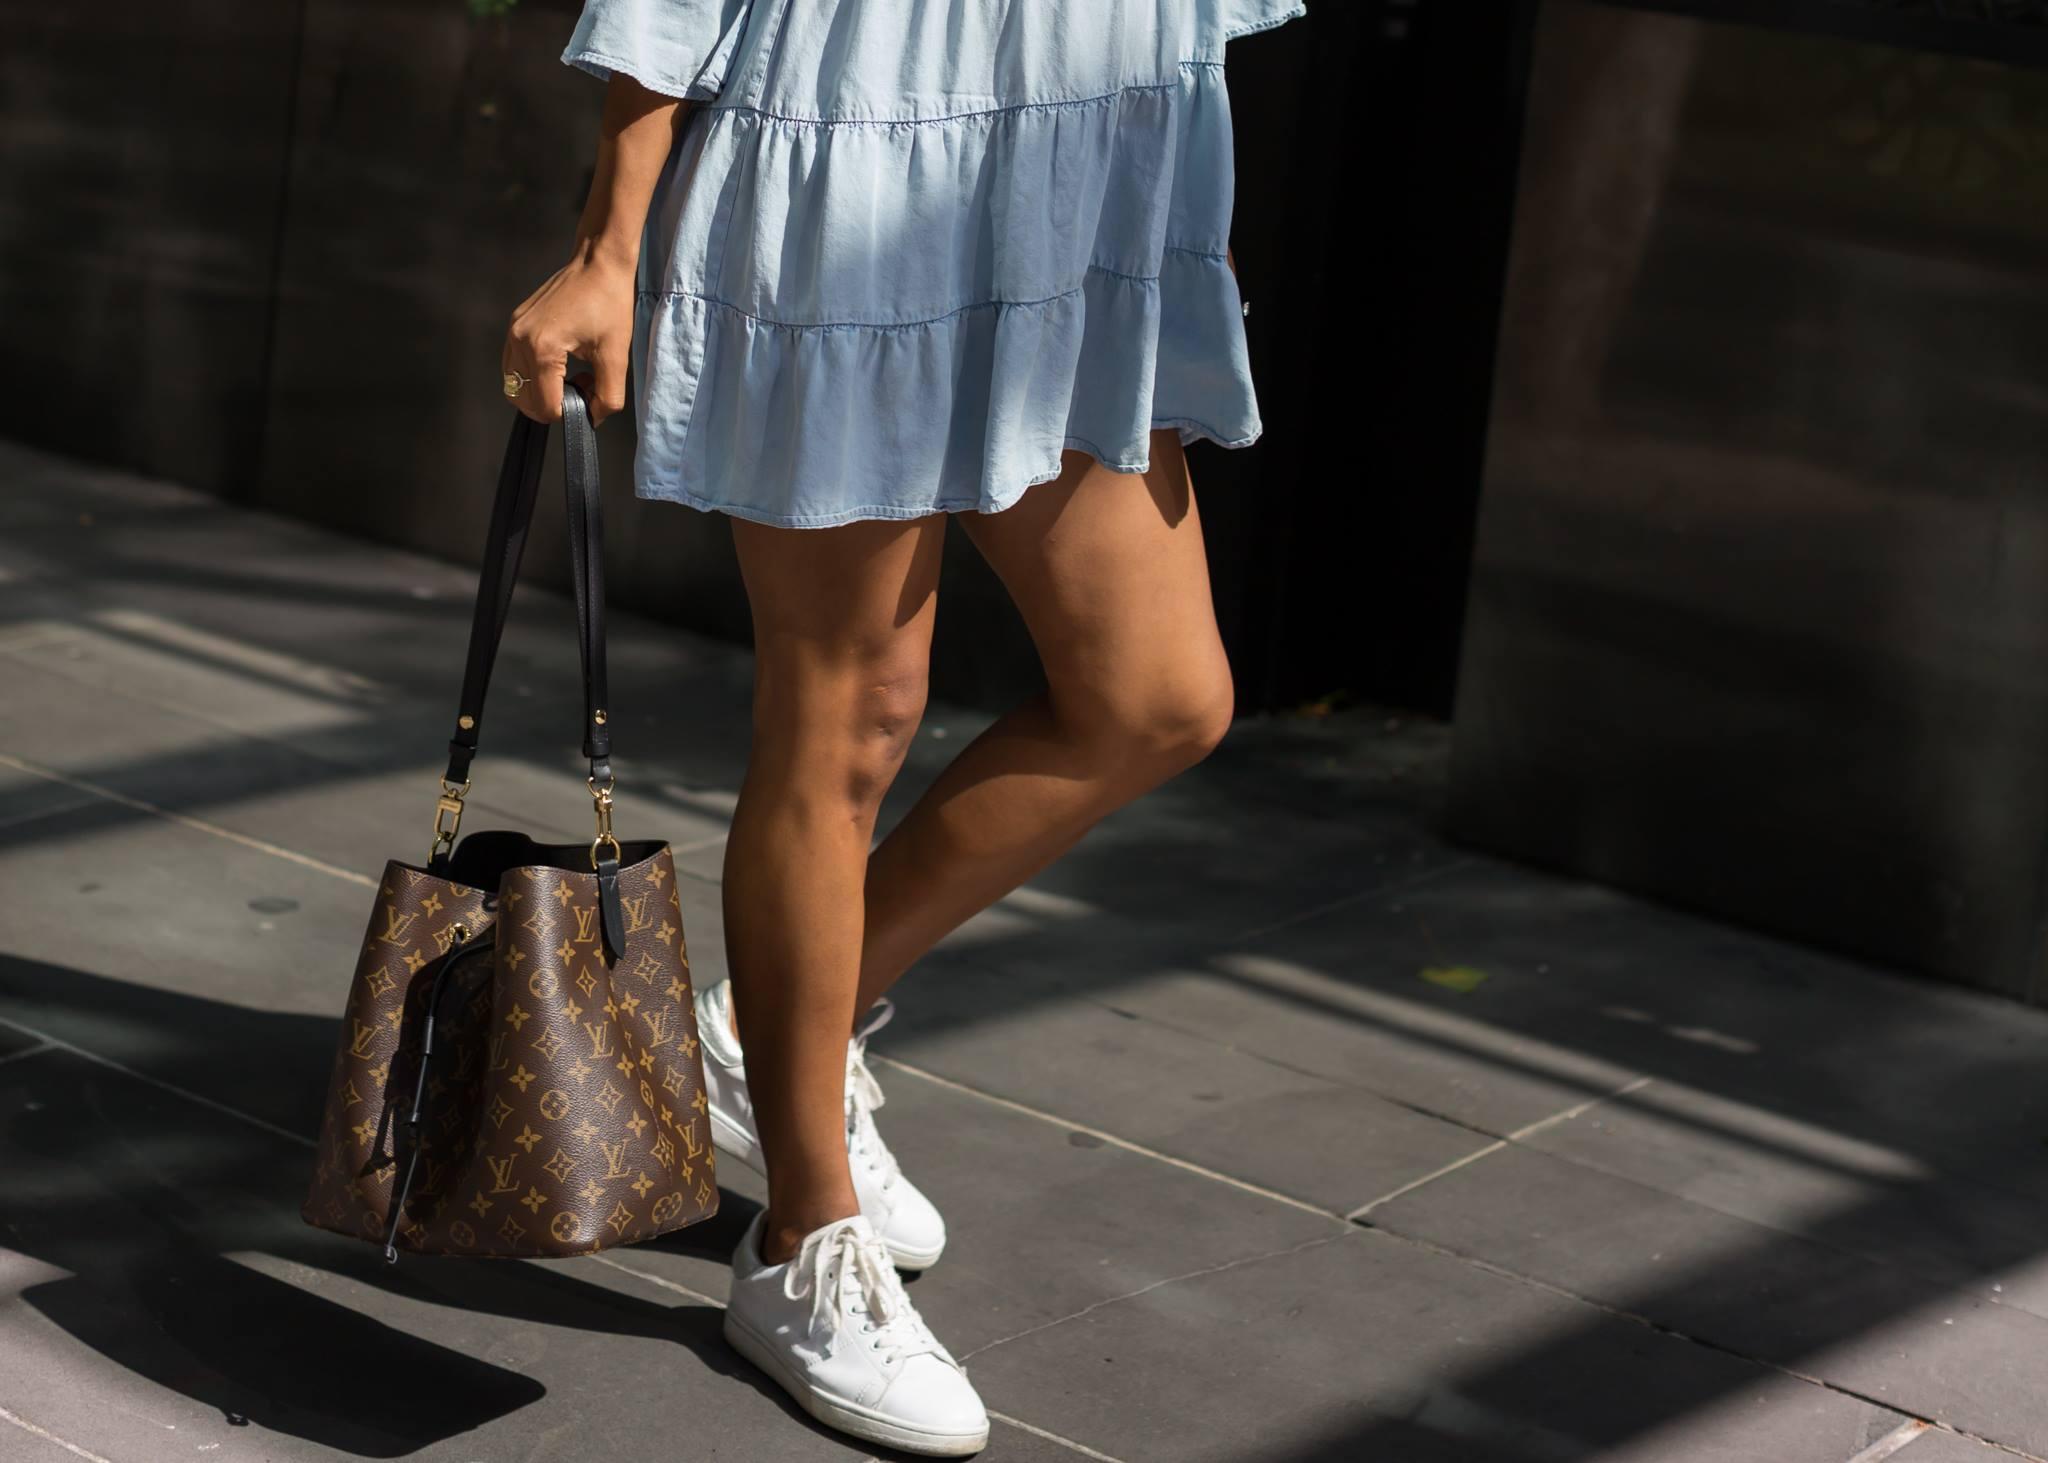 Victoria Latu, Pregnancy dress hot, Talking shop, styled Comfort dressing